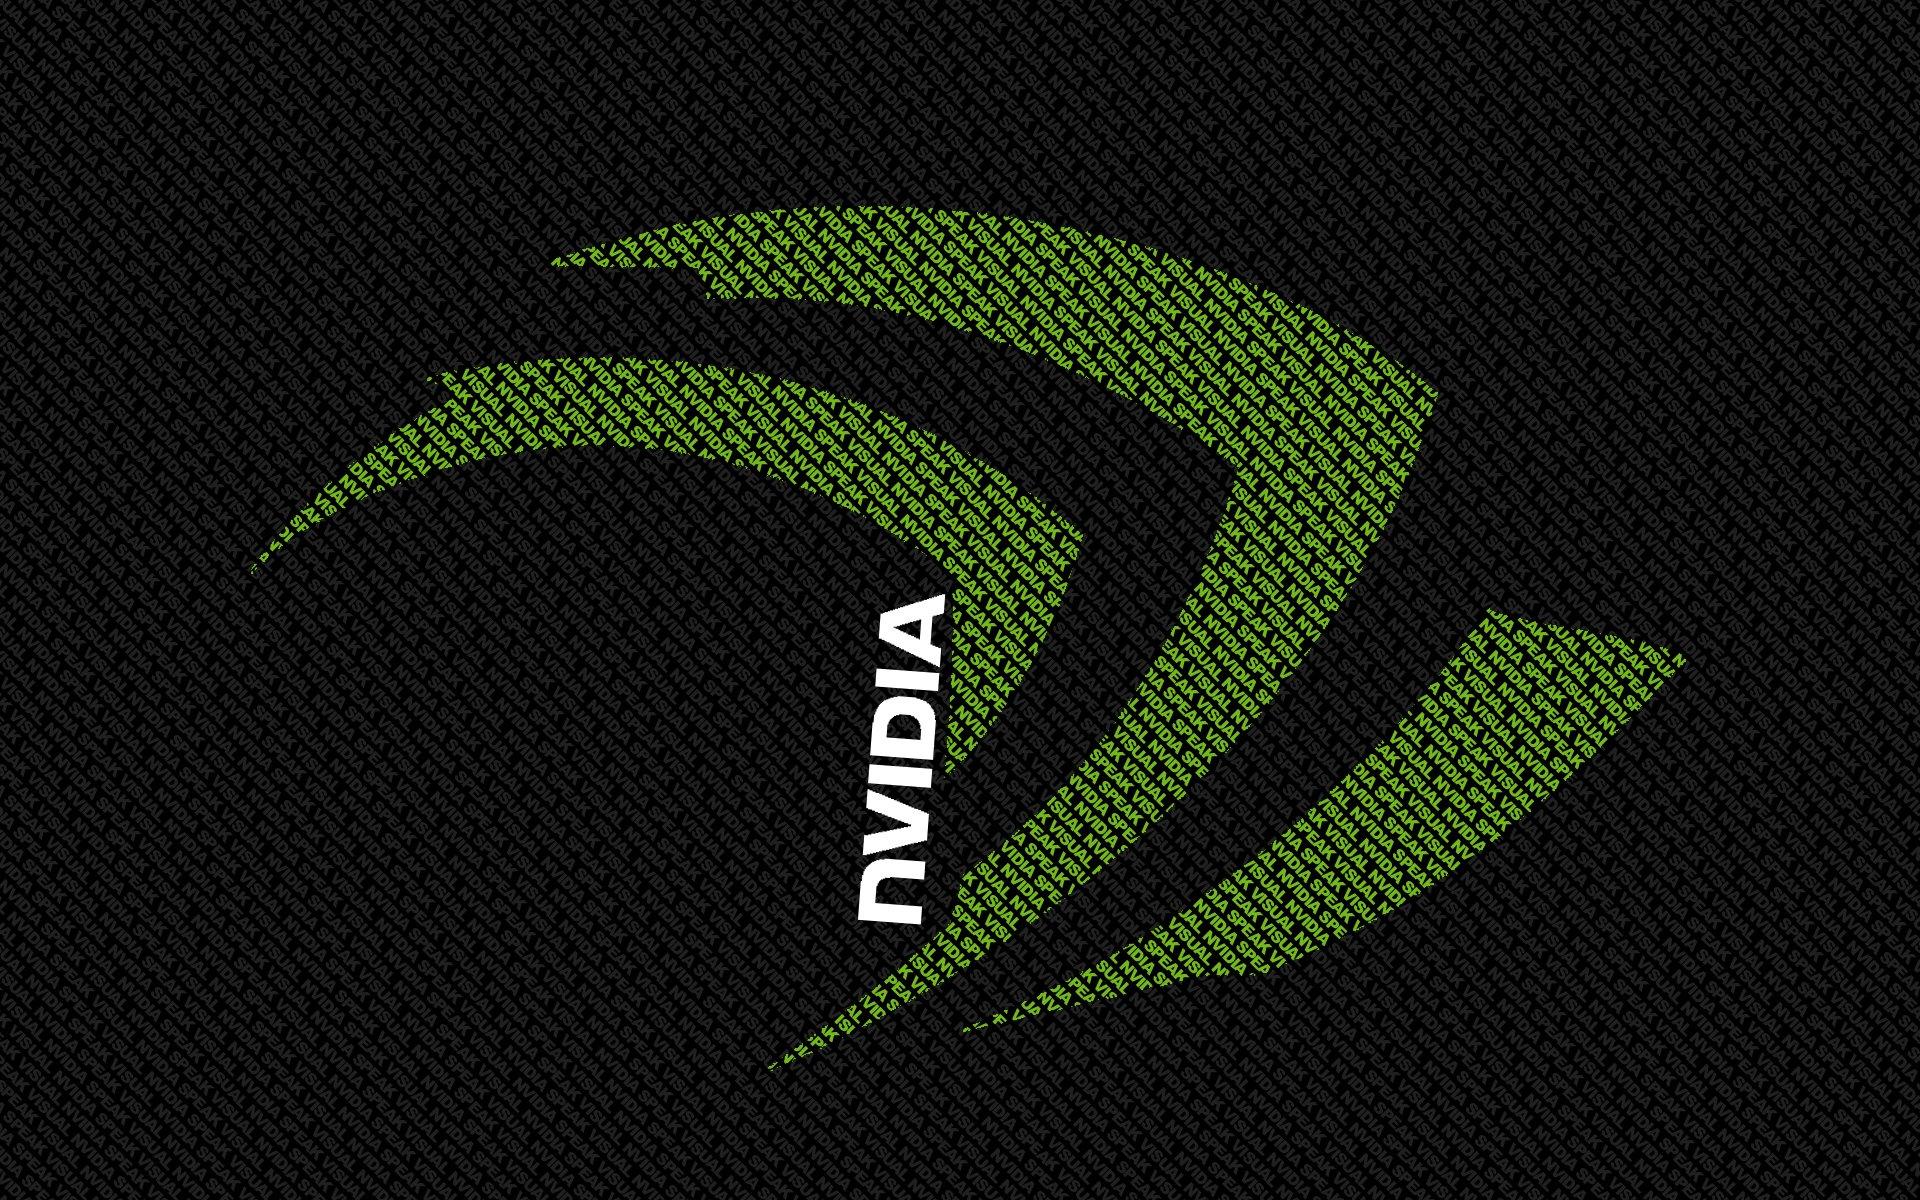 nvidia wallpaper 1600x900 - photo #5